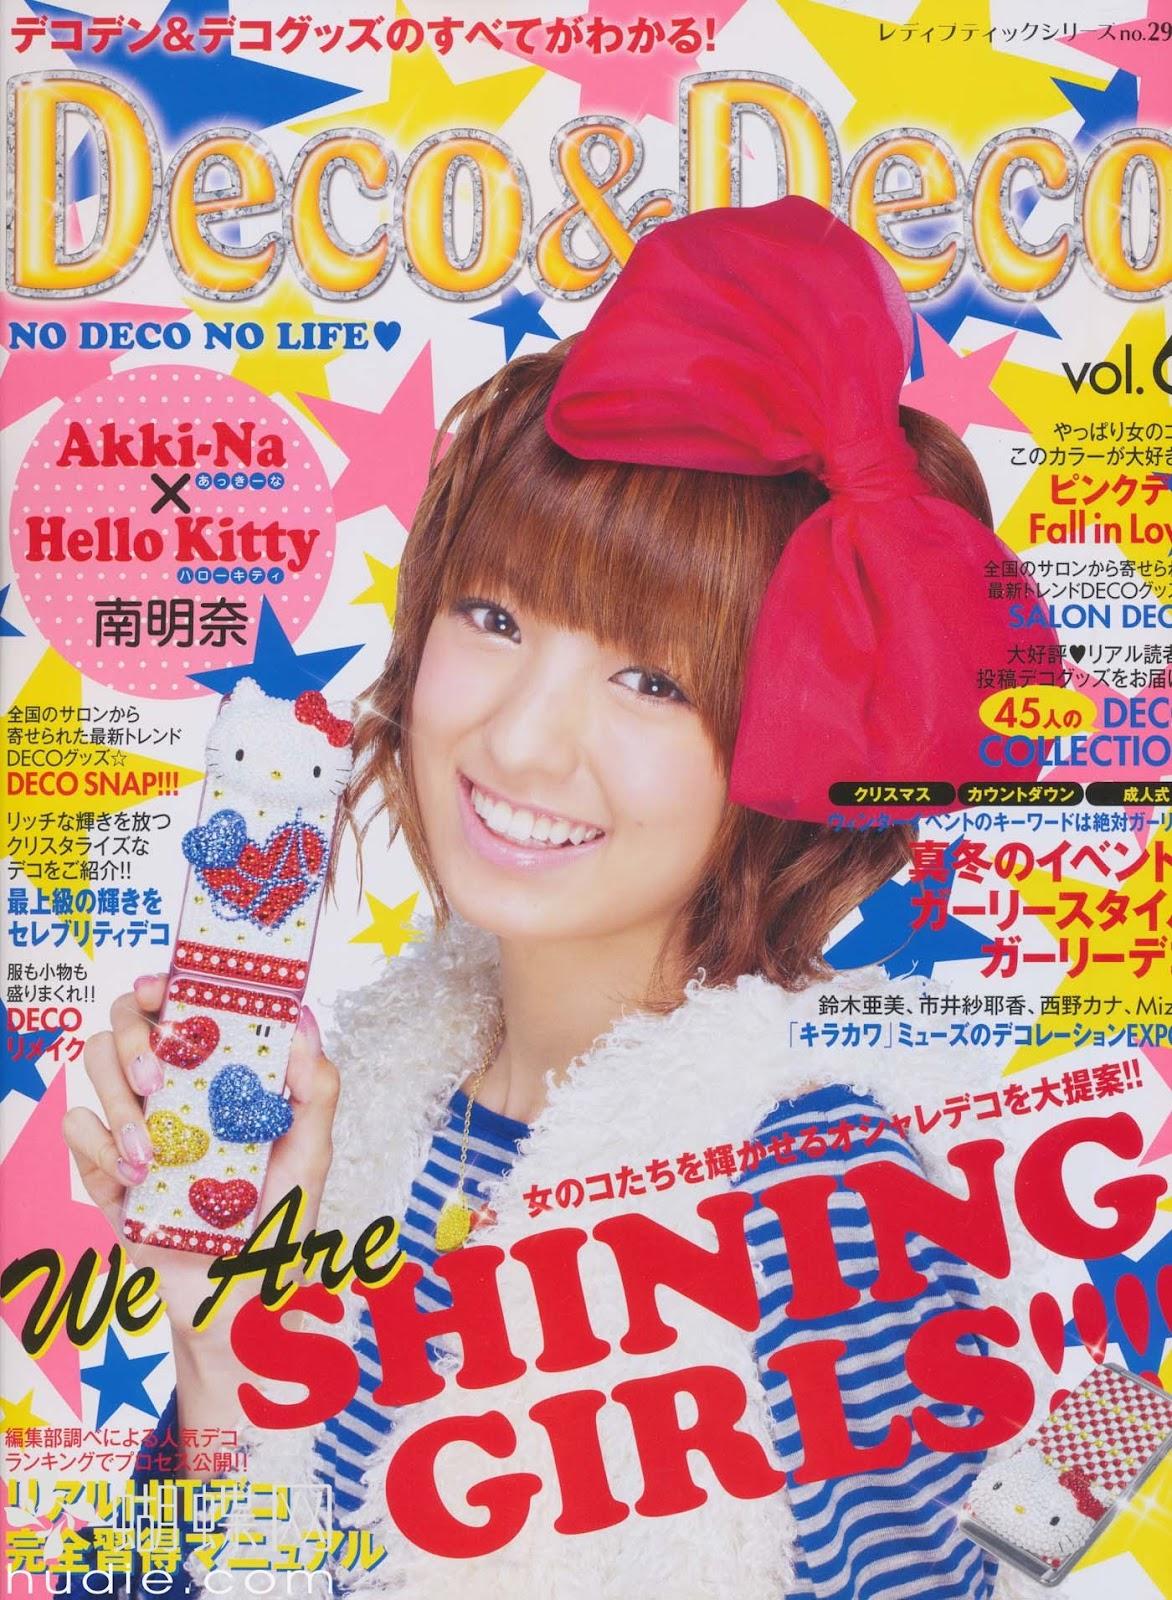 deco deco 2012 volume 6 japanese magazine scans